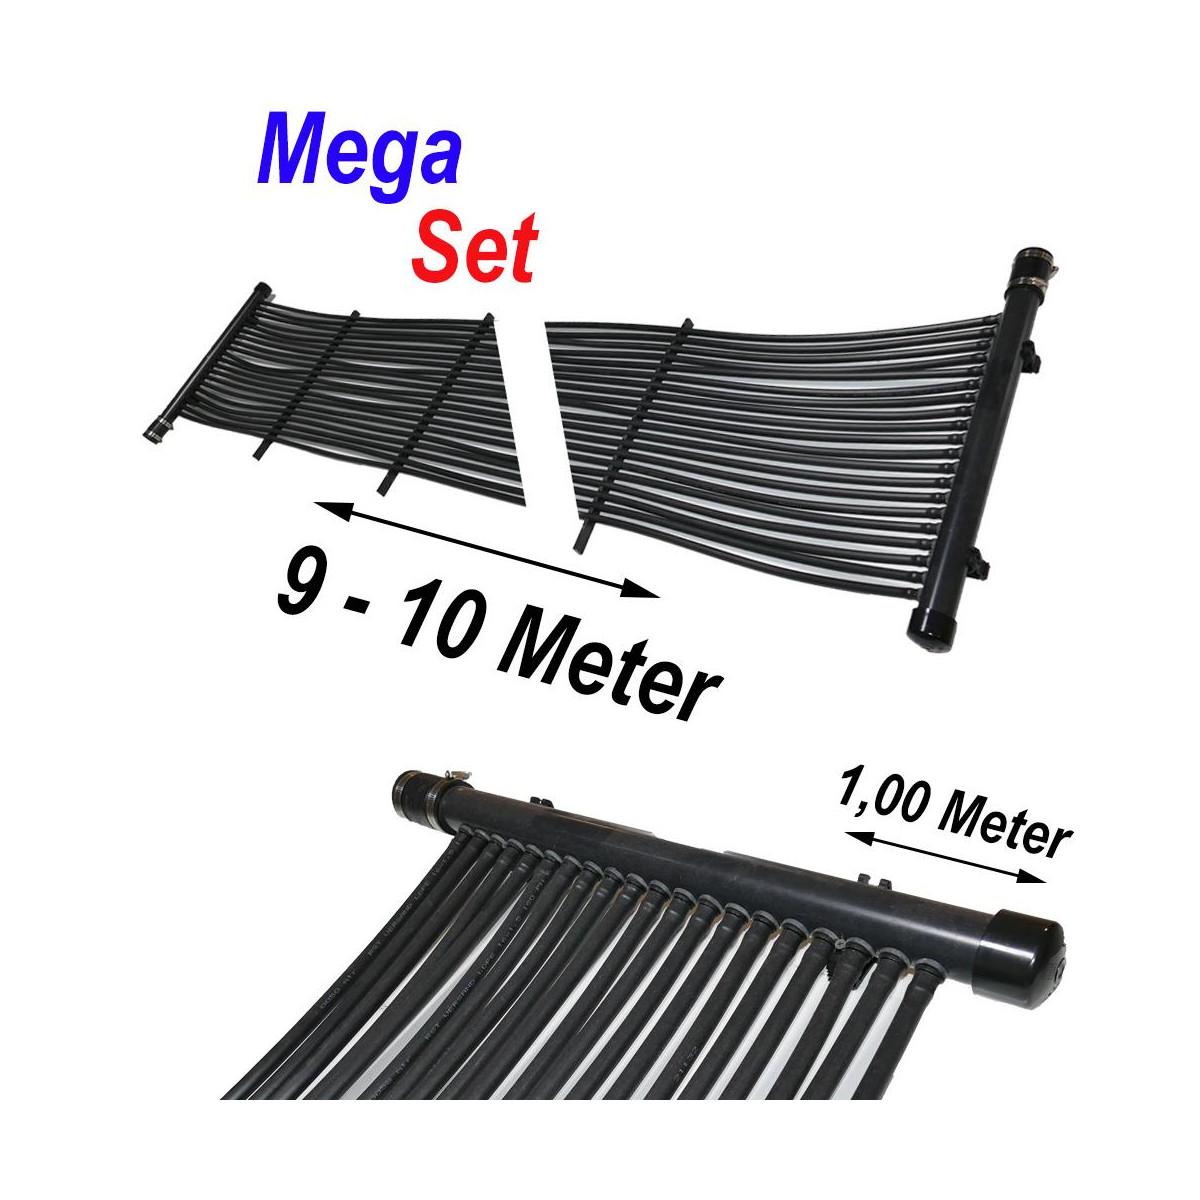 RST-VERSAND (Eigenmarke) Poolheizung Solarmatte MegaSet 9,00 m² (300 Meter)